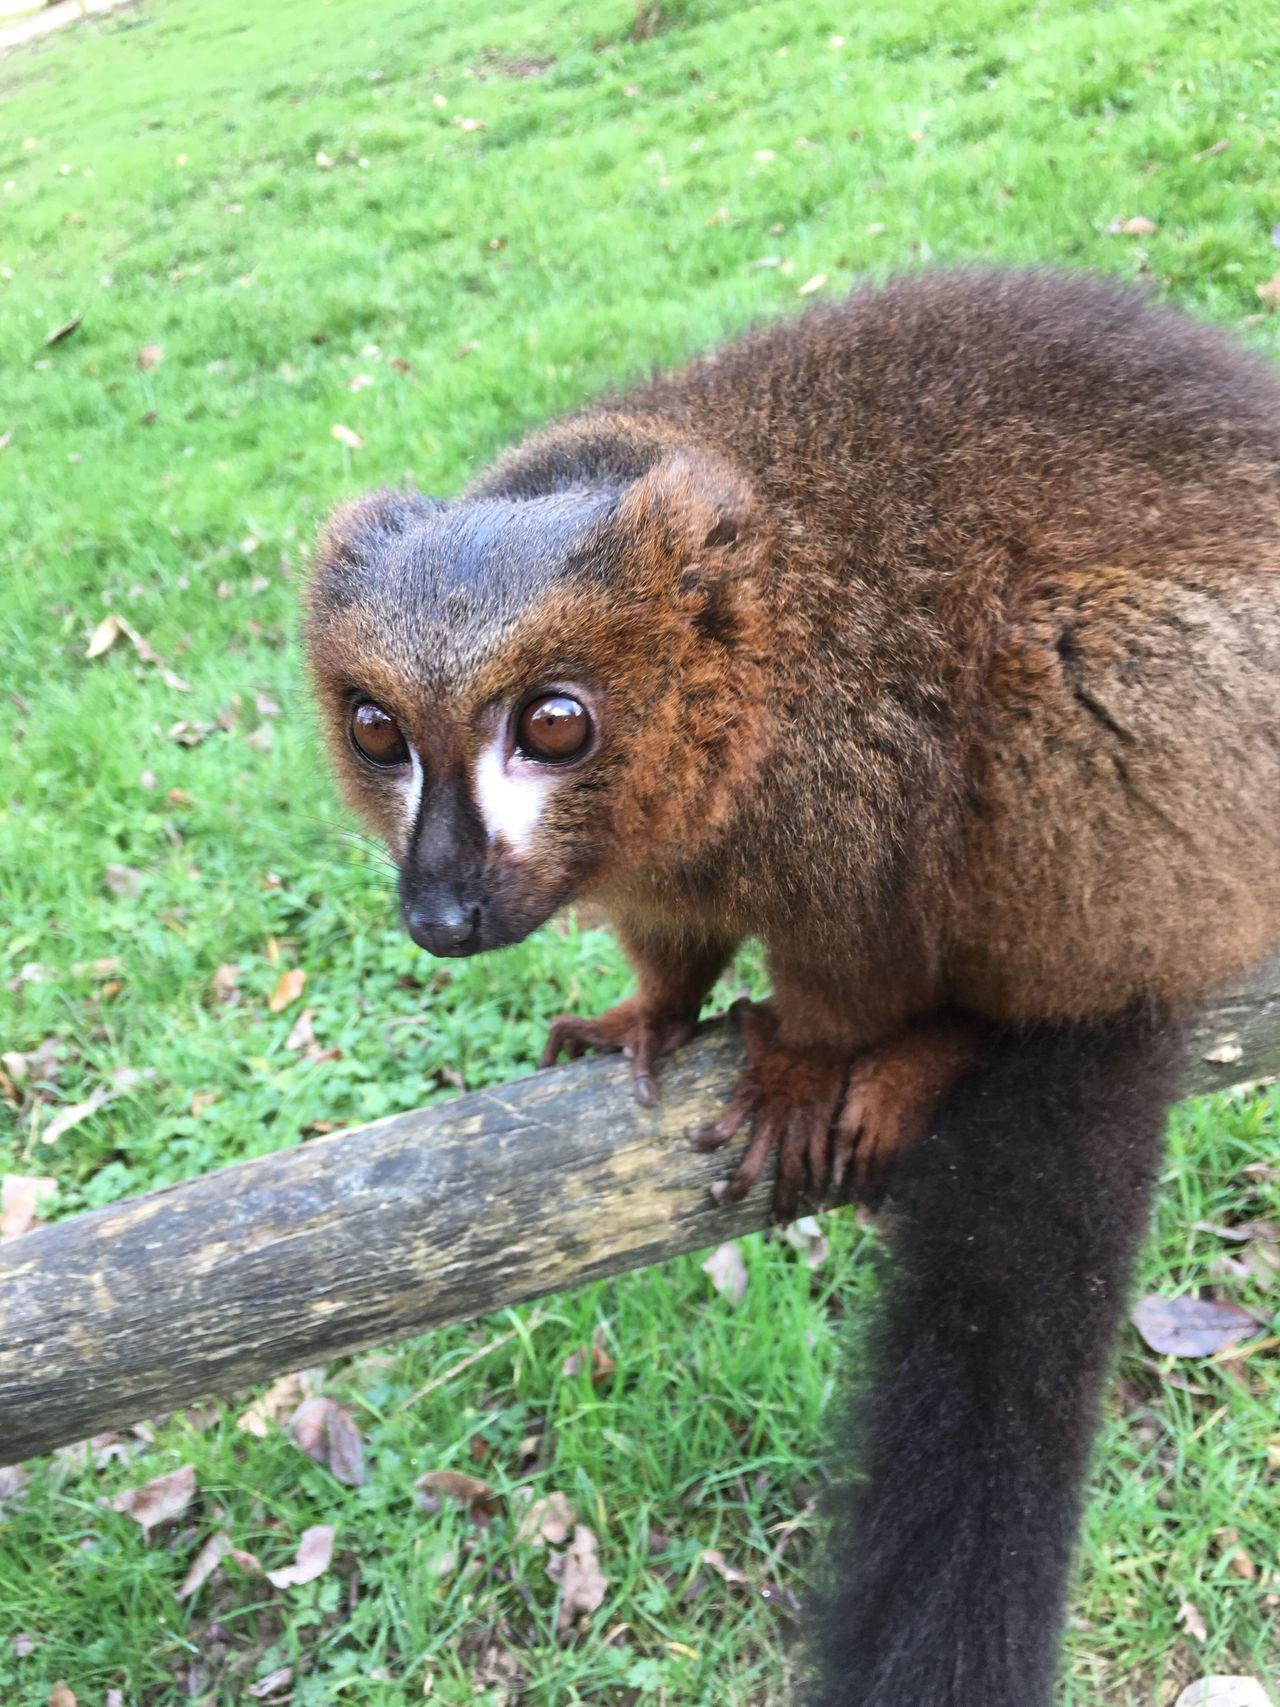 Beauty In Nature Animal Themes One Animal Animal Wildlife Grass Red Panda Zoo Tree